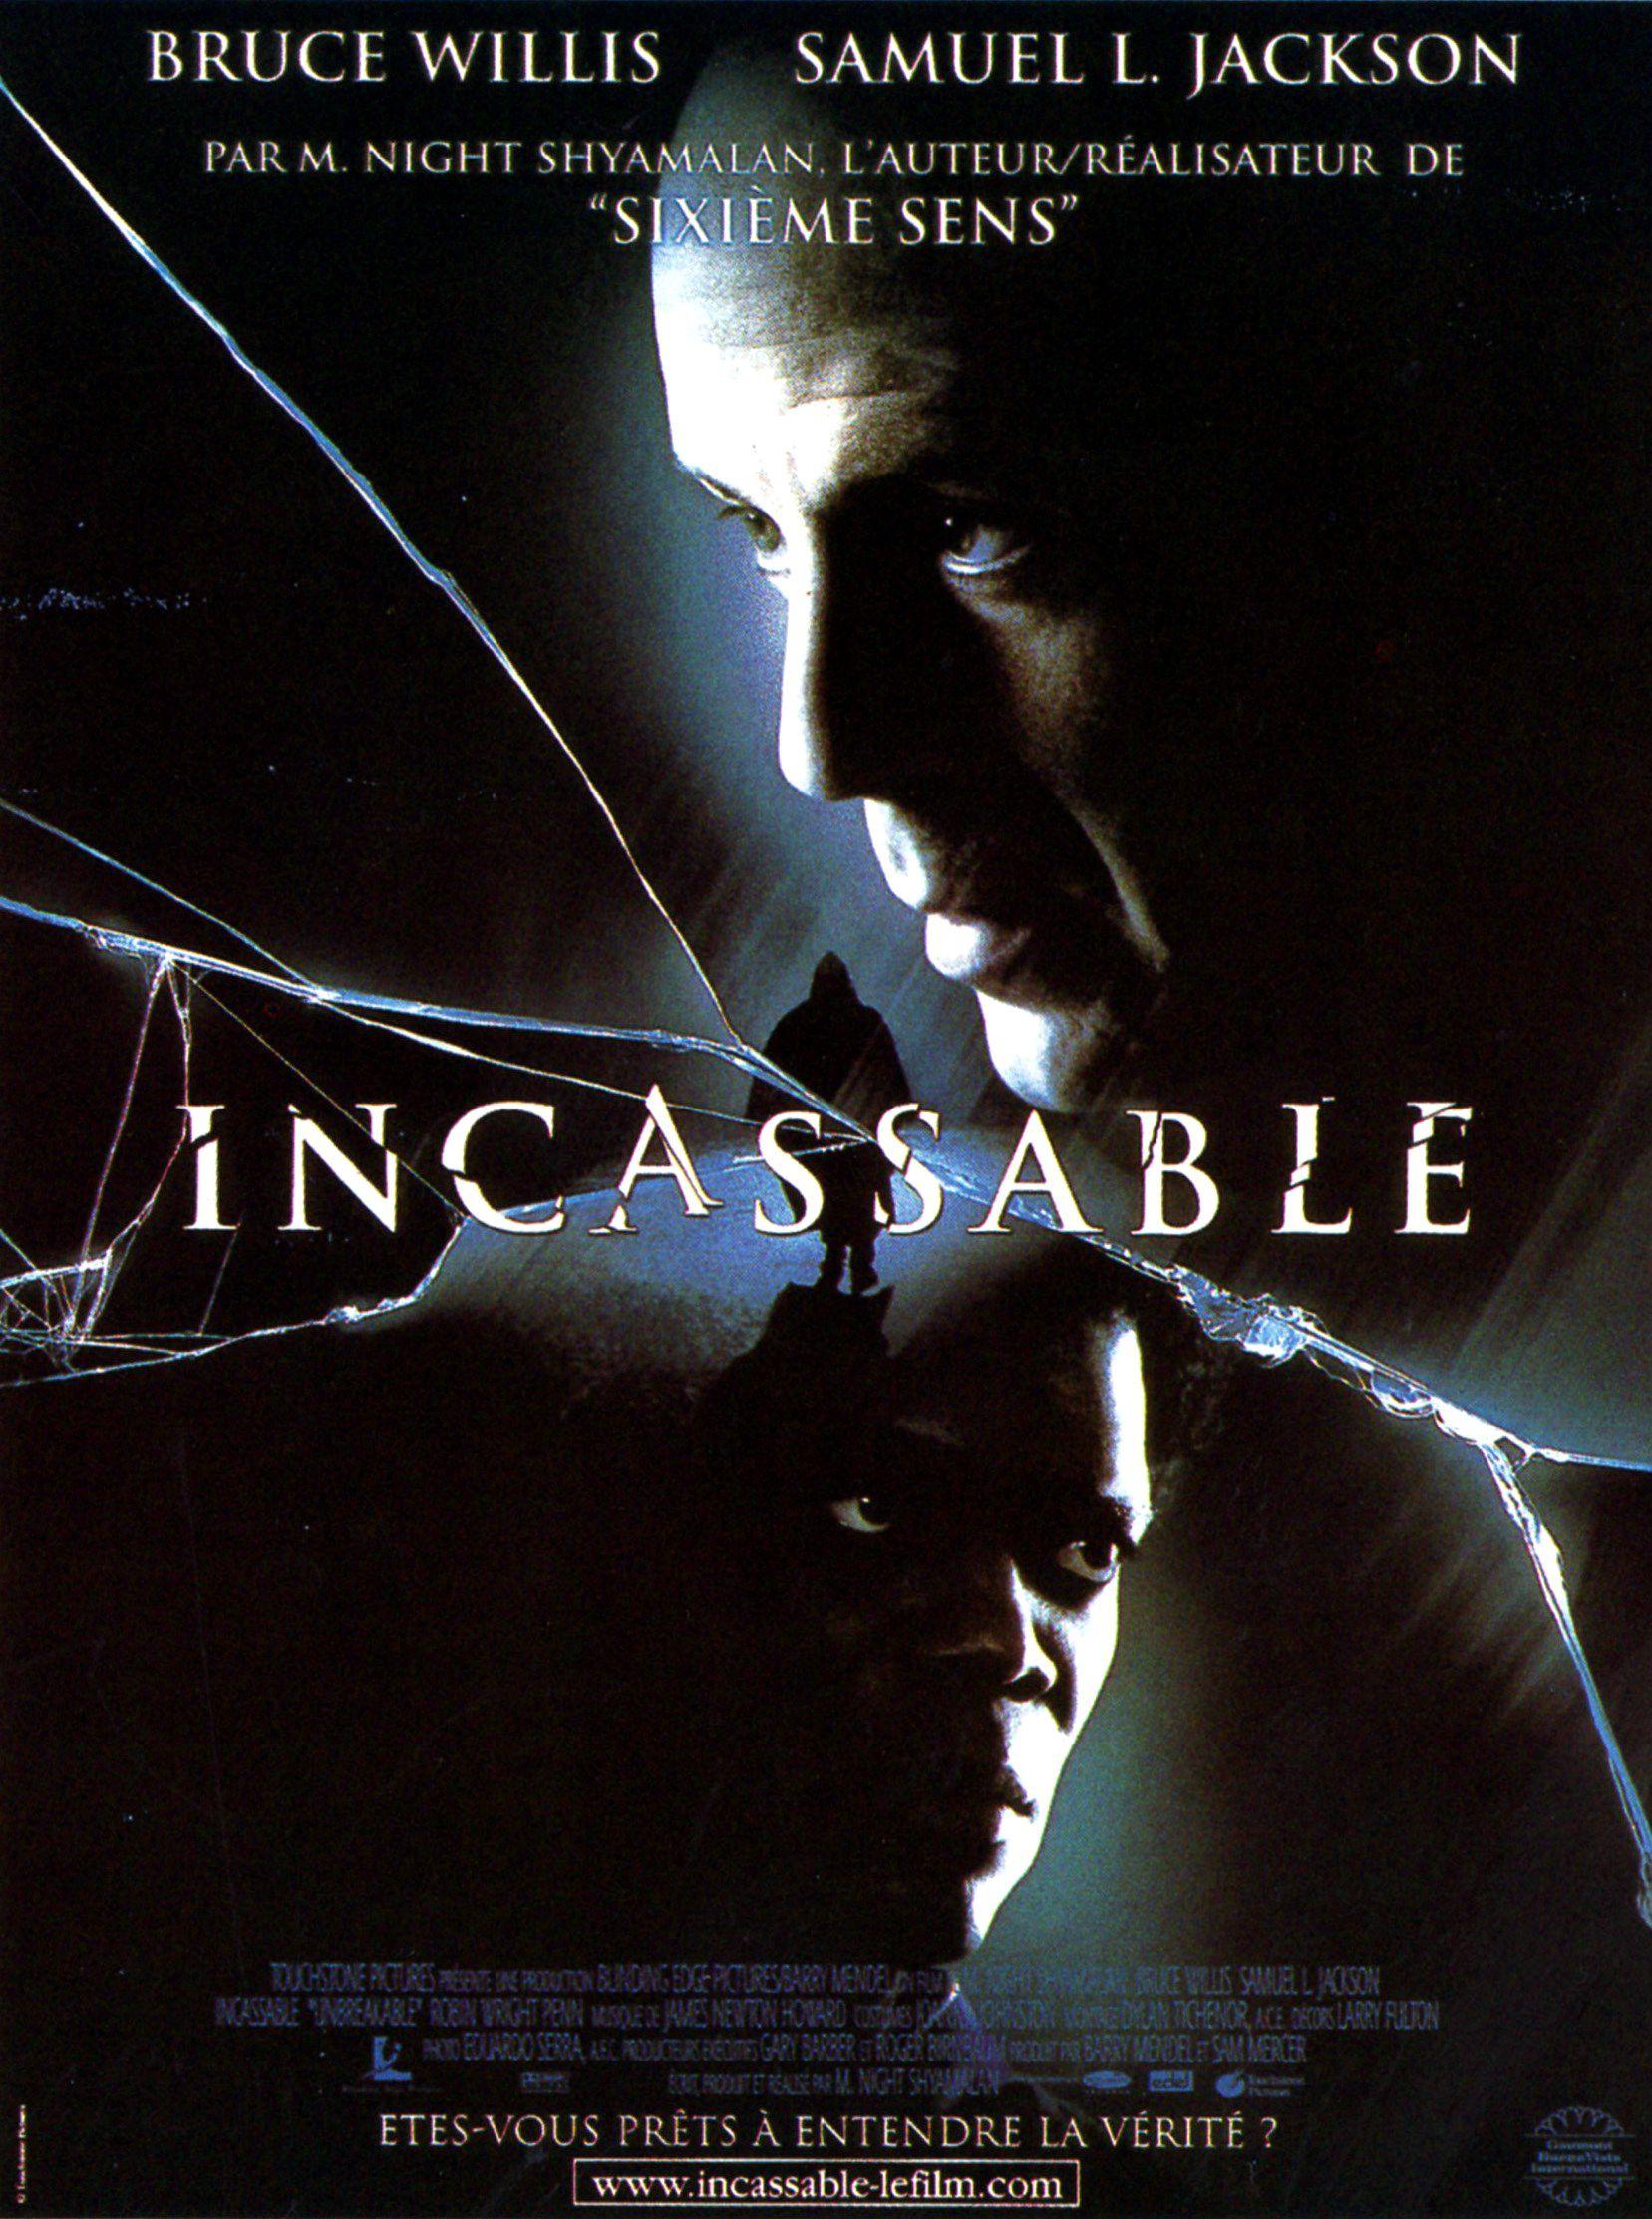 Affiche Poster Incassable Unbreakable Disney Touchstone pictures